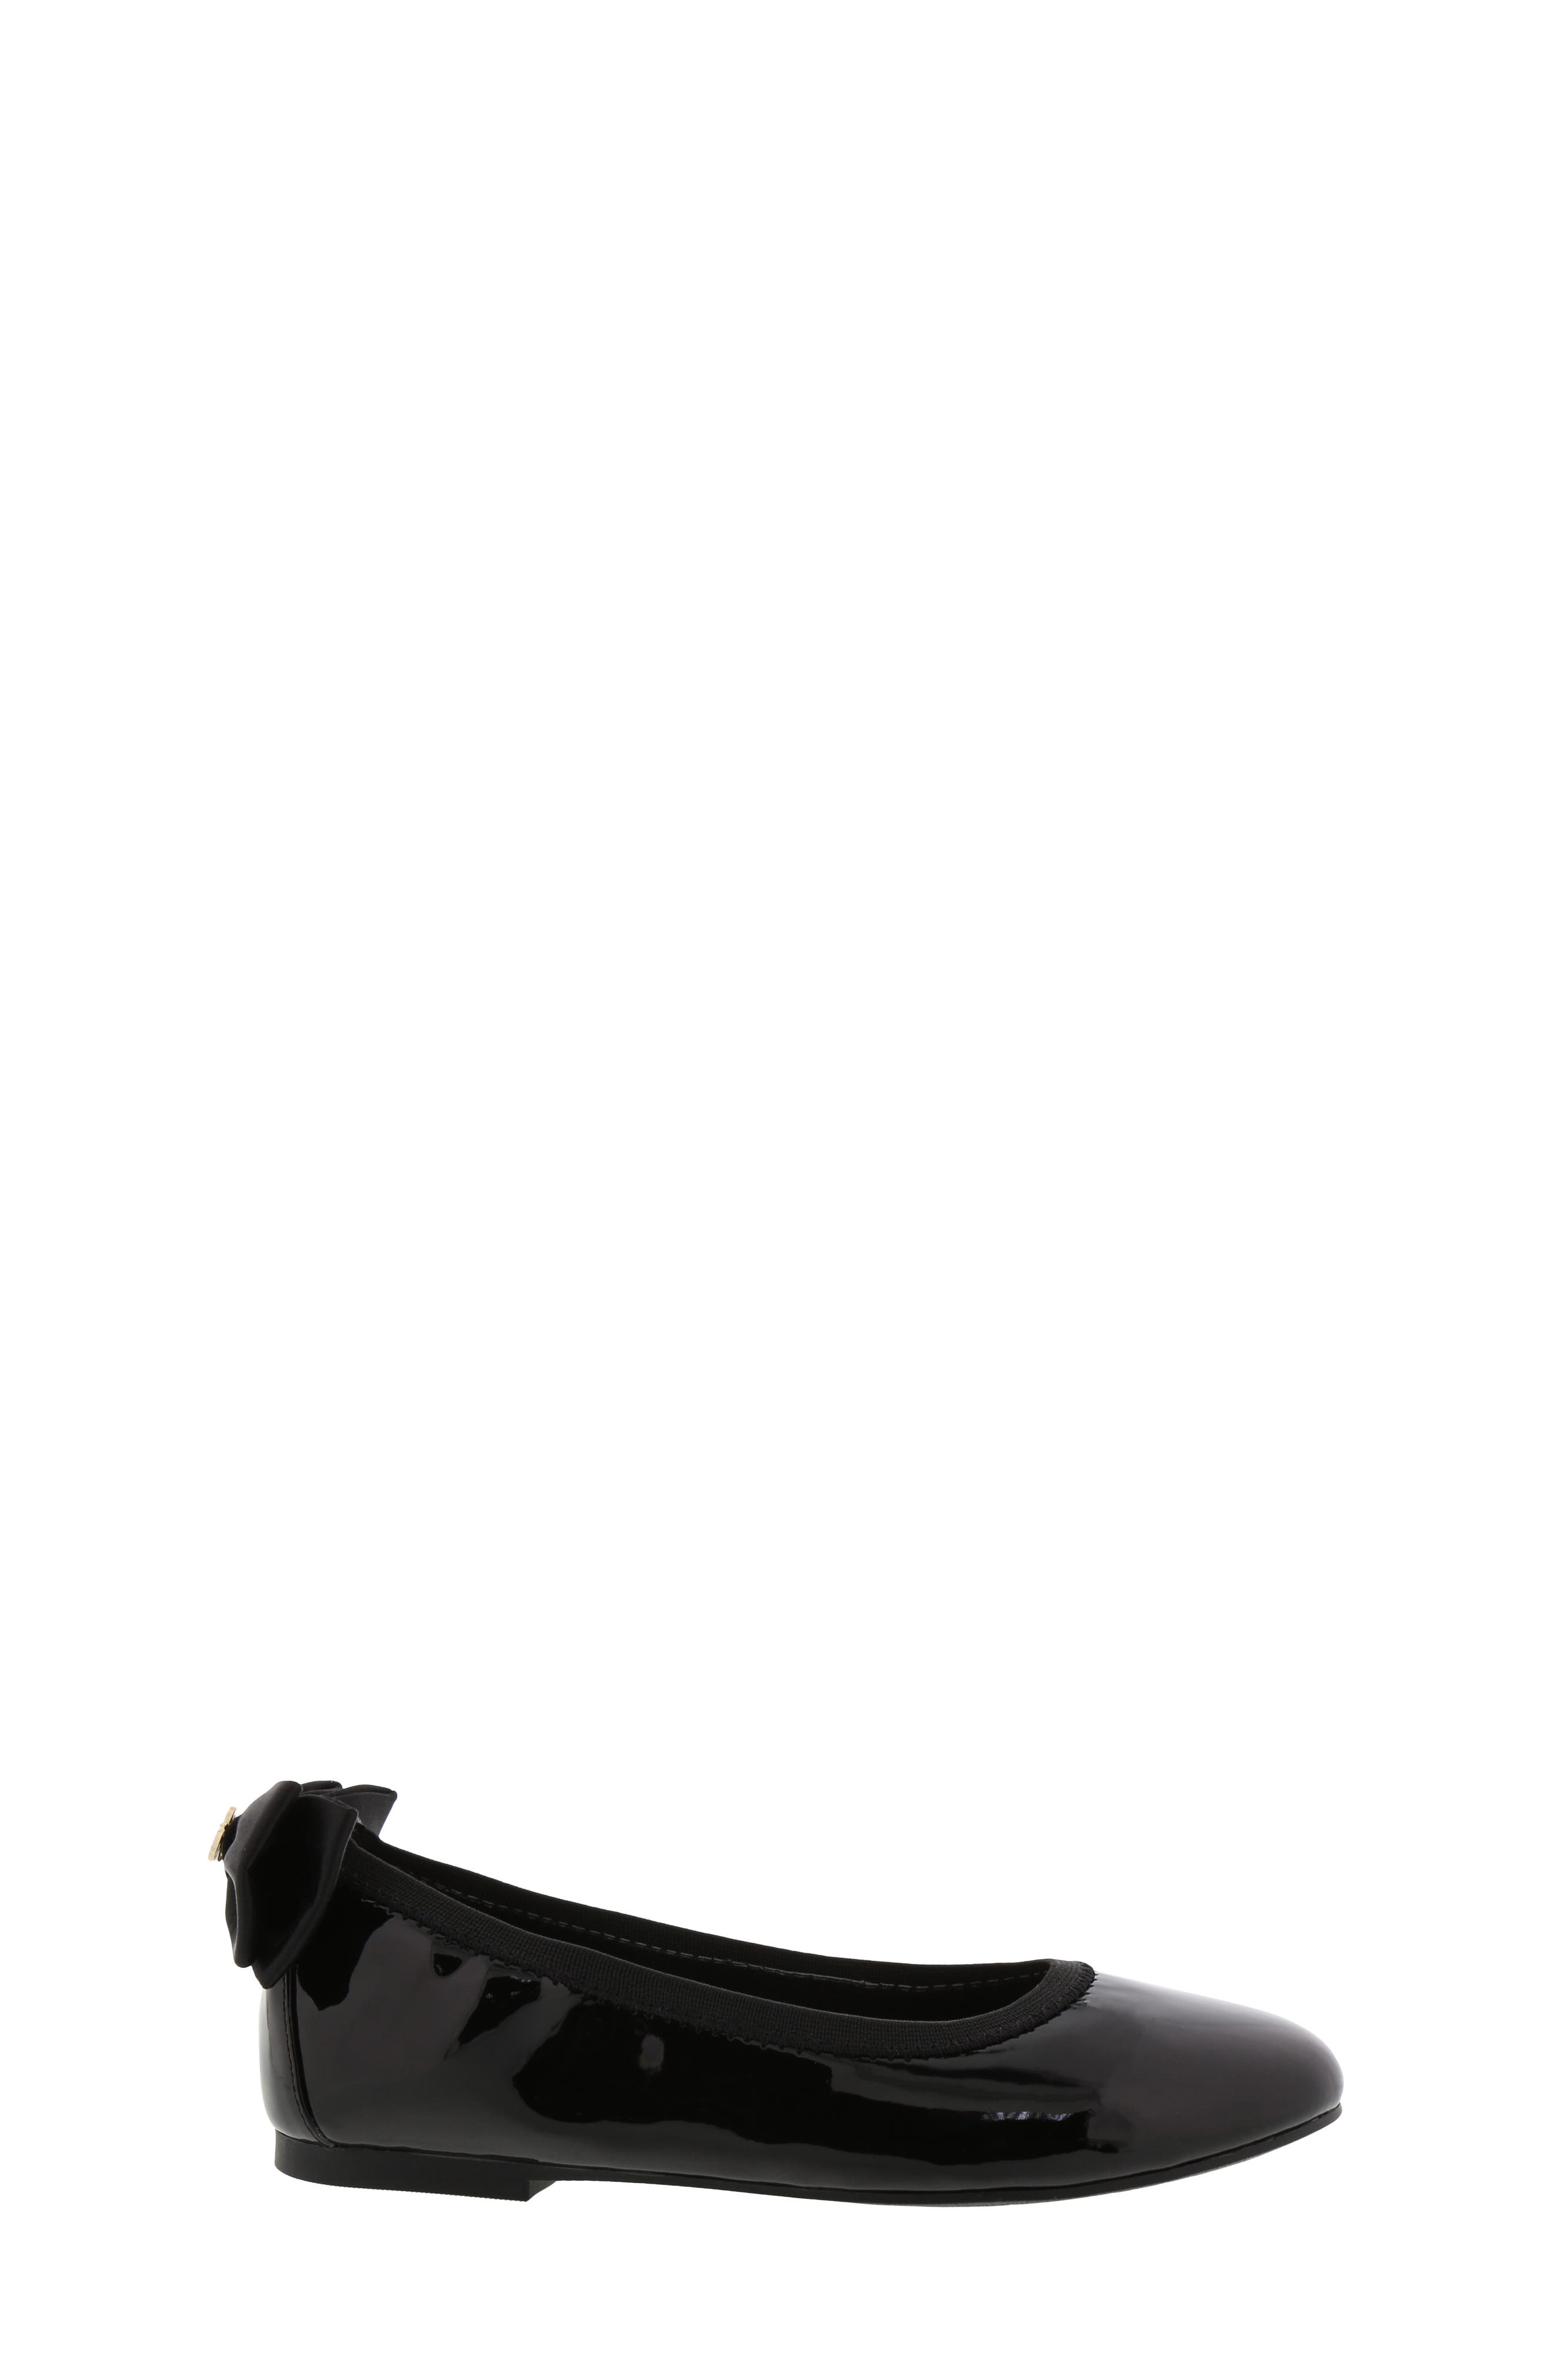 SAM EDELMAN, Felicia Esmerelda Ballet Flat, Alternate thumbnail 3, color, BLACK PATENT